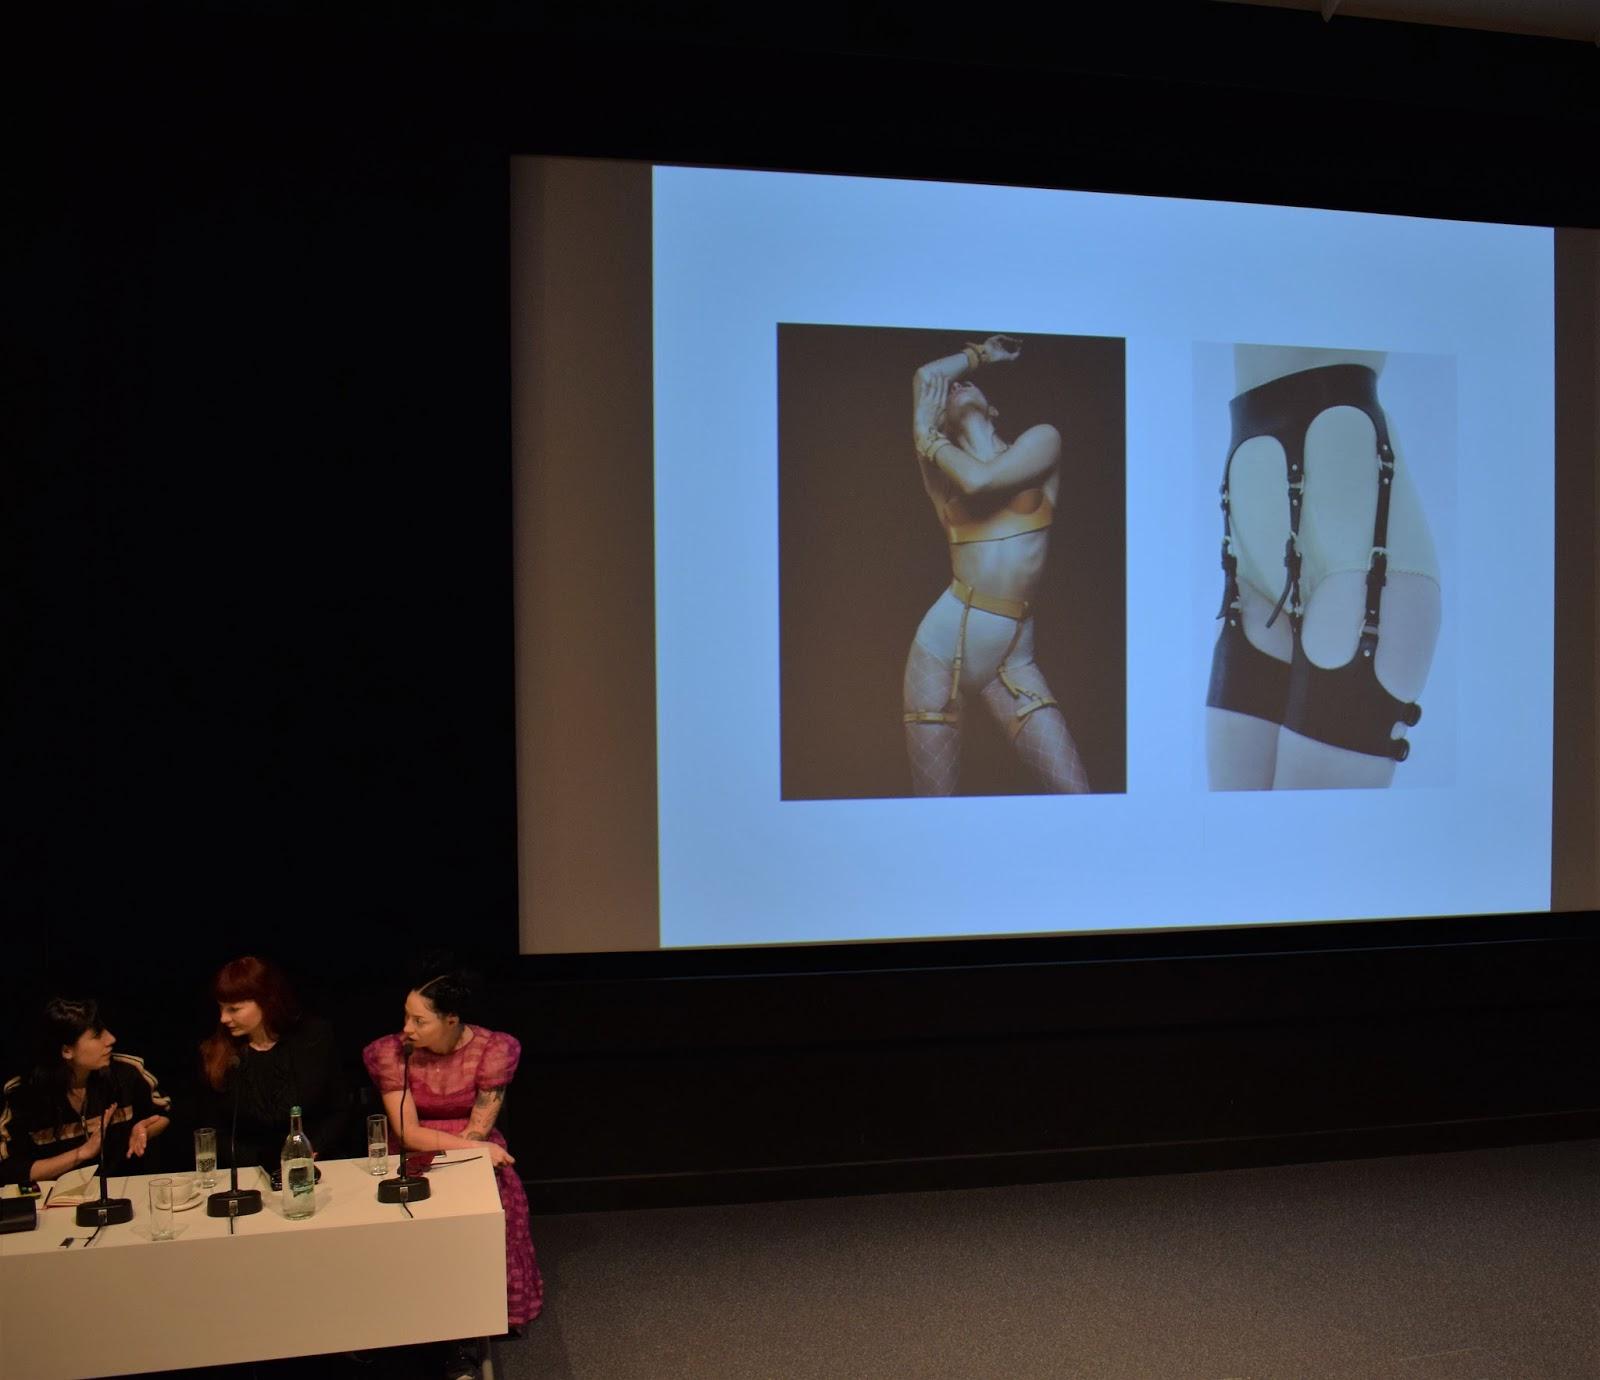 Edinburgh International Fashion Festival, symposium at National Museum of Scotland, desire and sexuality in fashion,